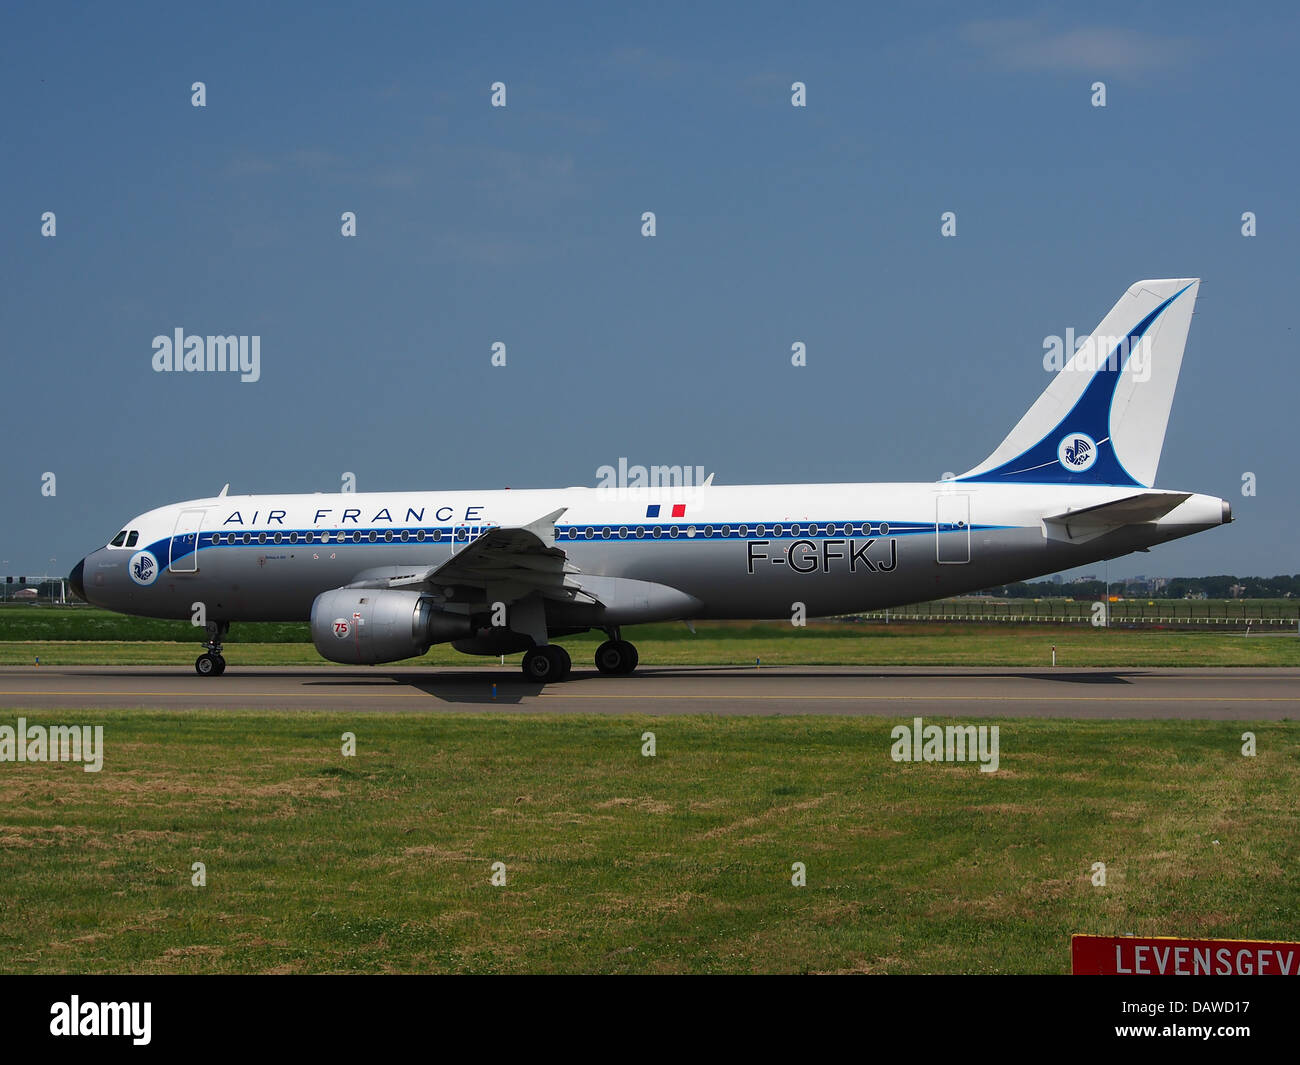 F-GFKJ Air France Airbus A320-211 - cn 063 - 5 Photo Stock